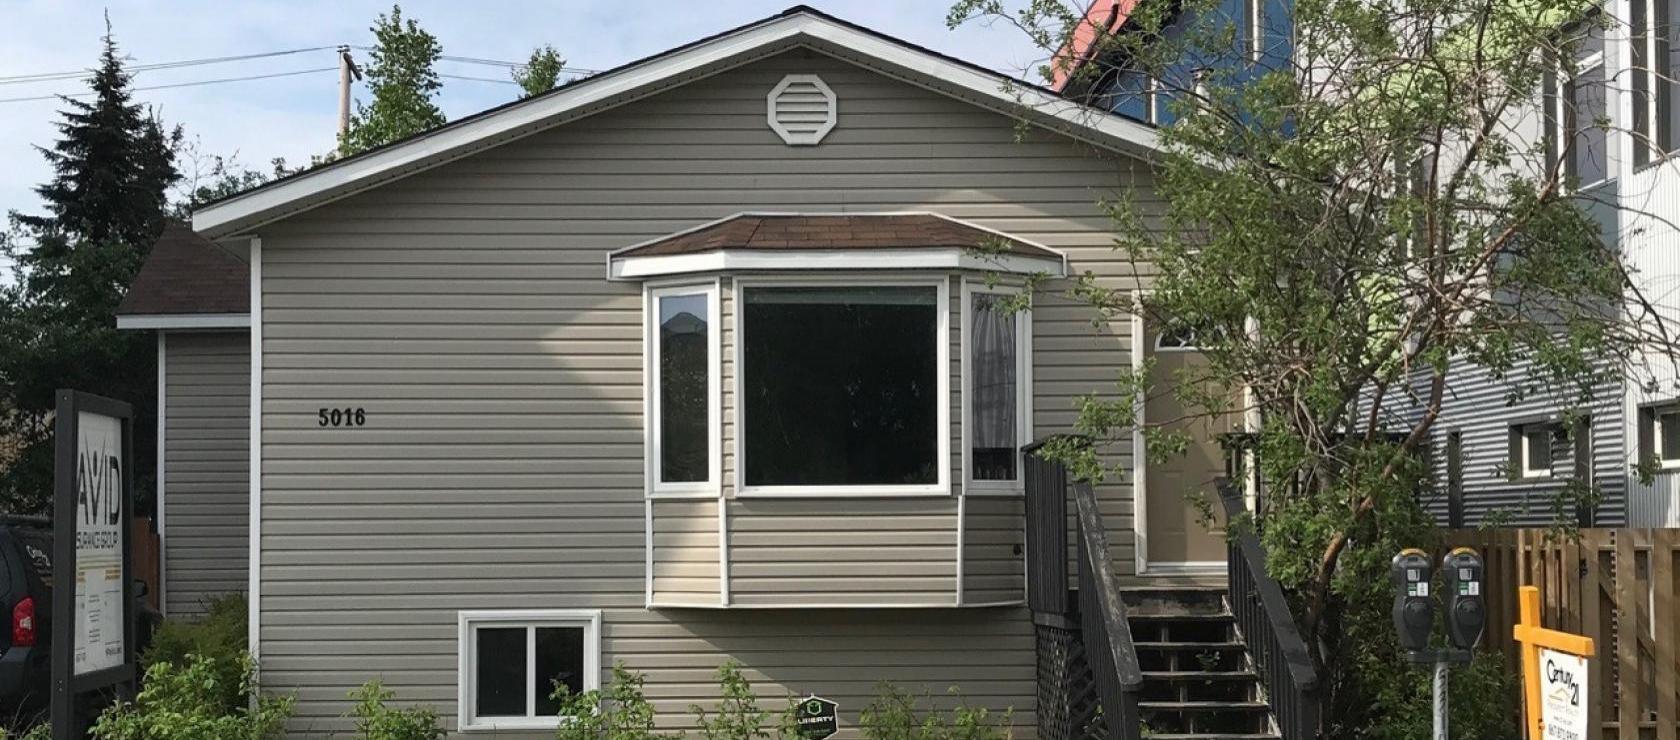 5016 53 Street, Downtown, Yellowknife 2